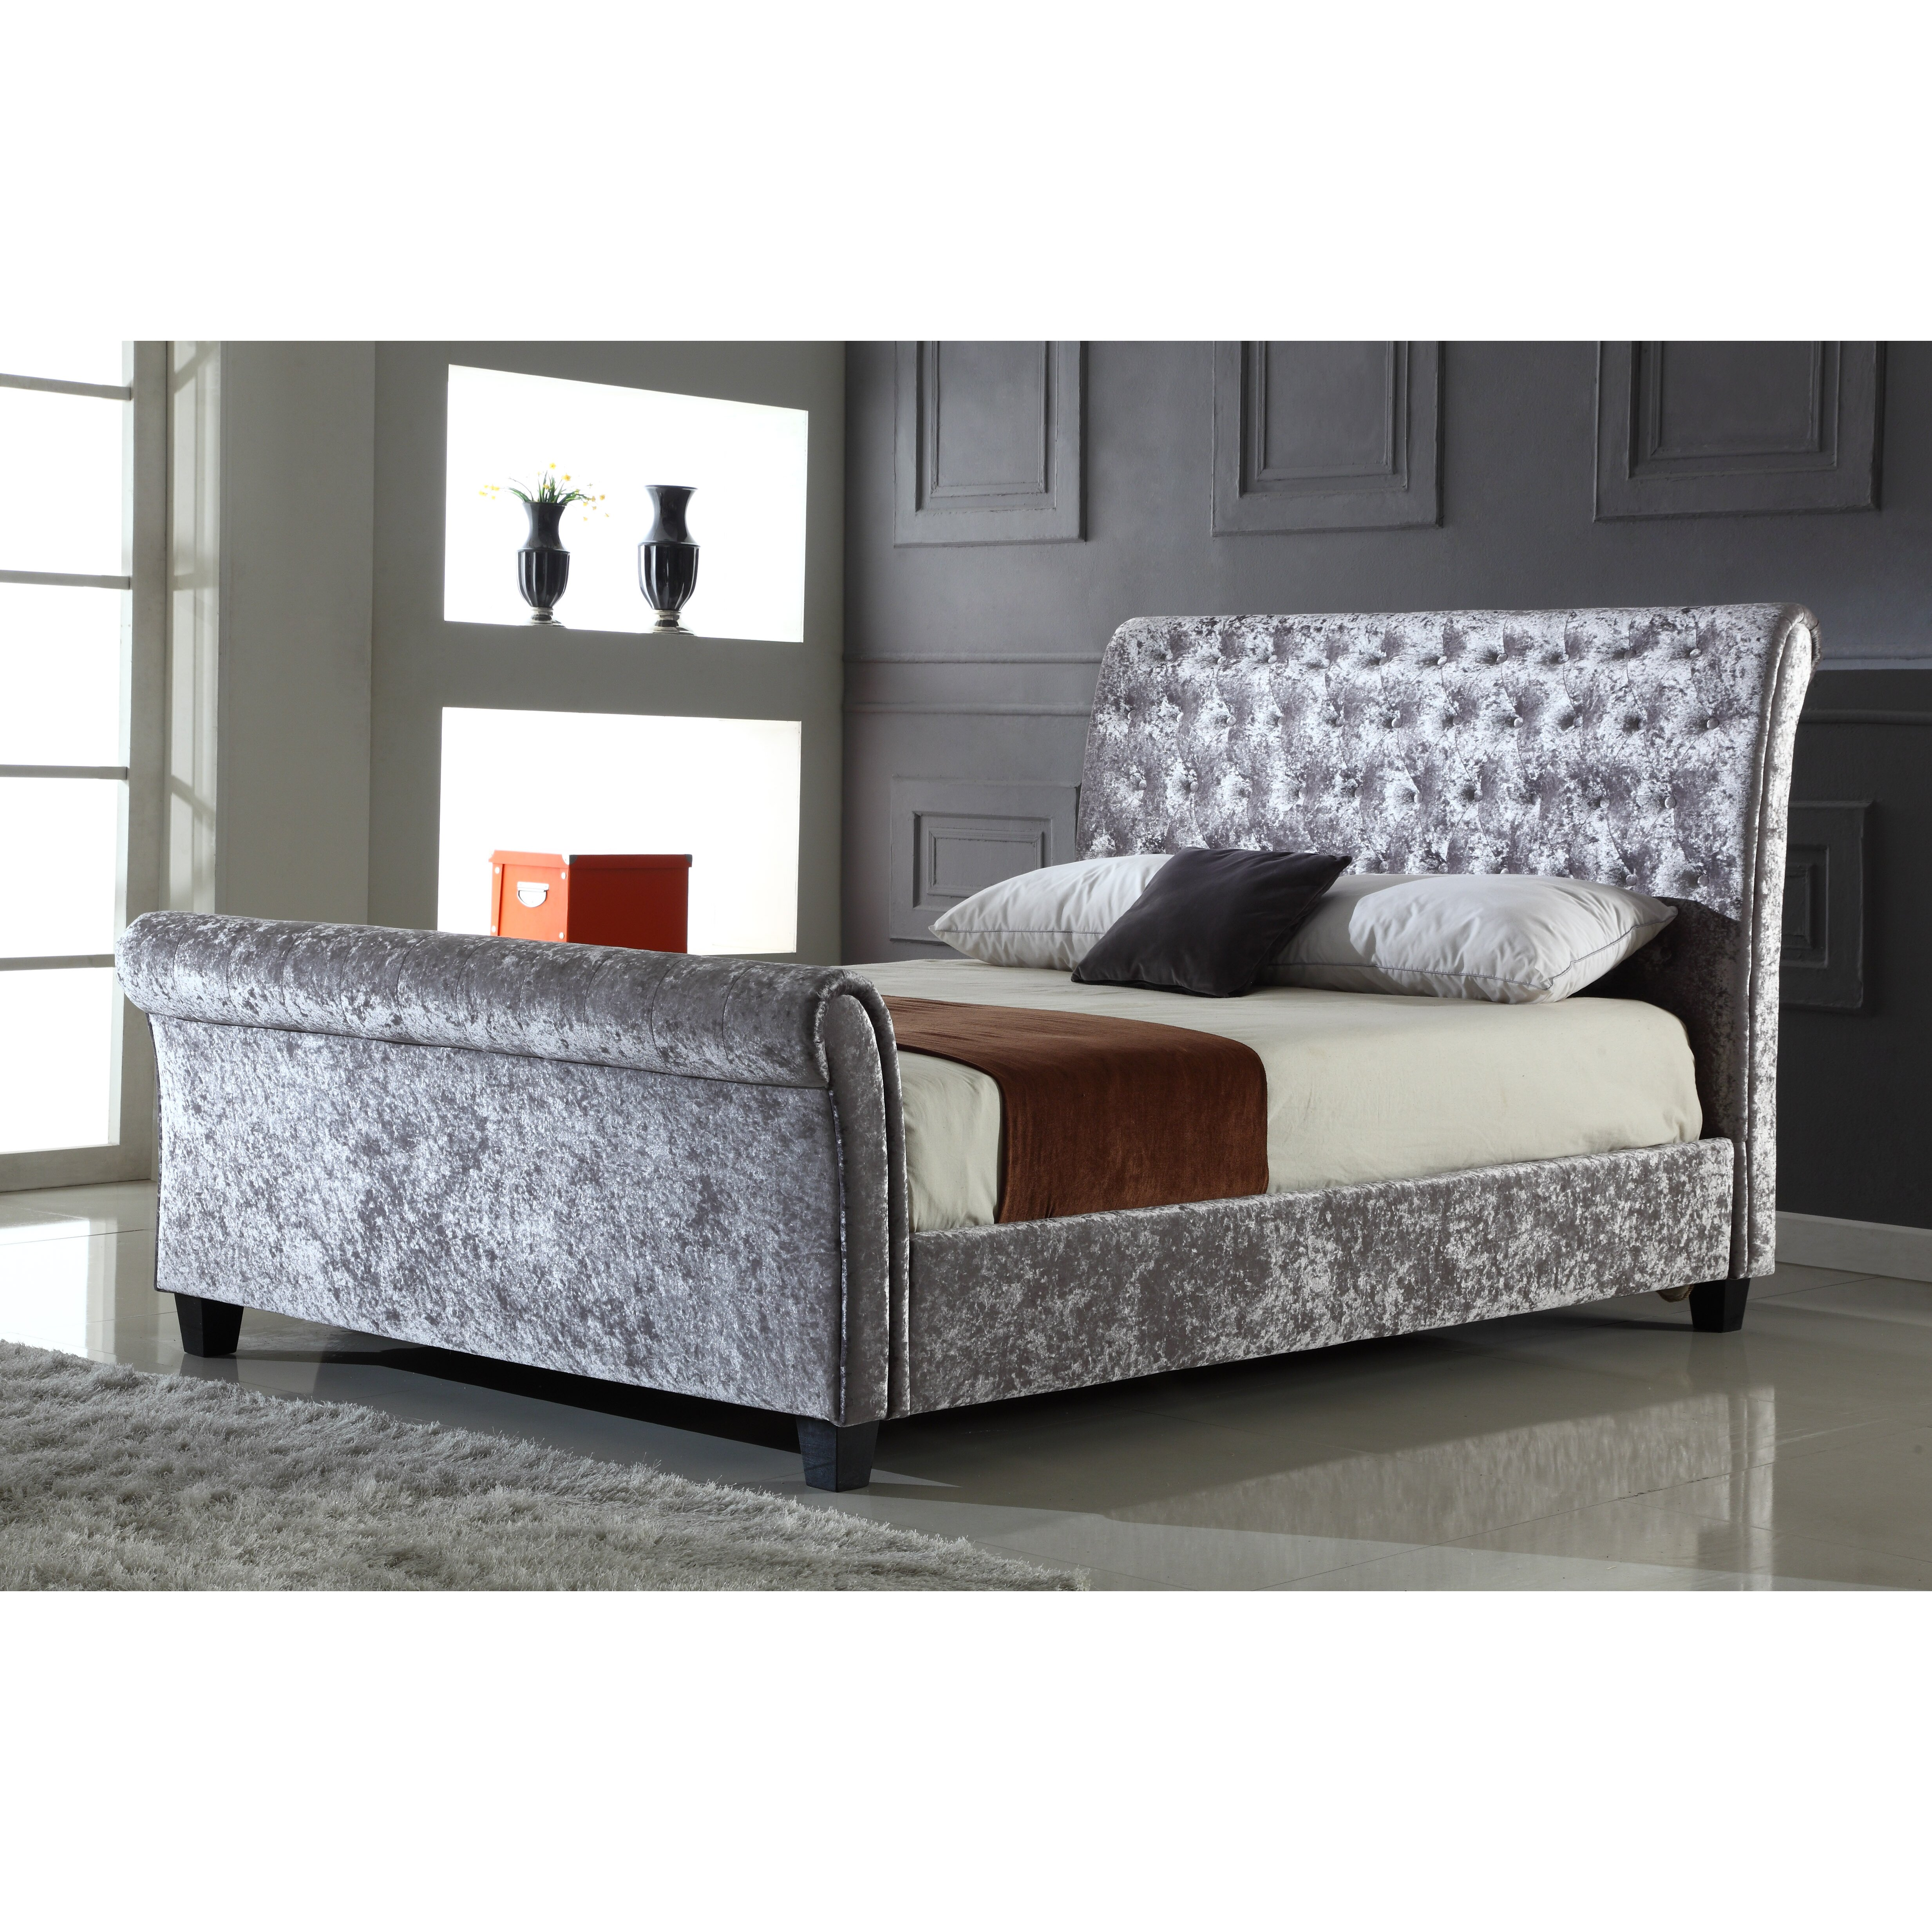 Heartlands serenity upholstered sleigh bed reviews for Upholstered sleigh bedroom set